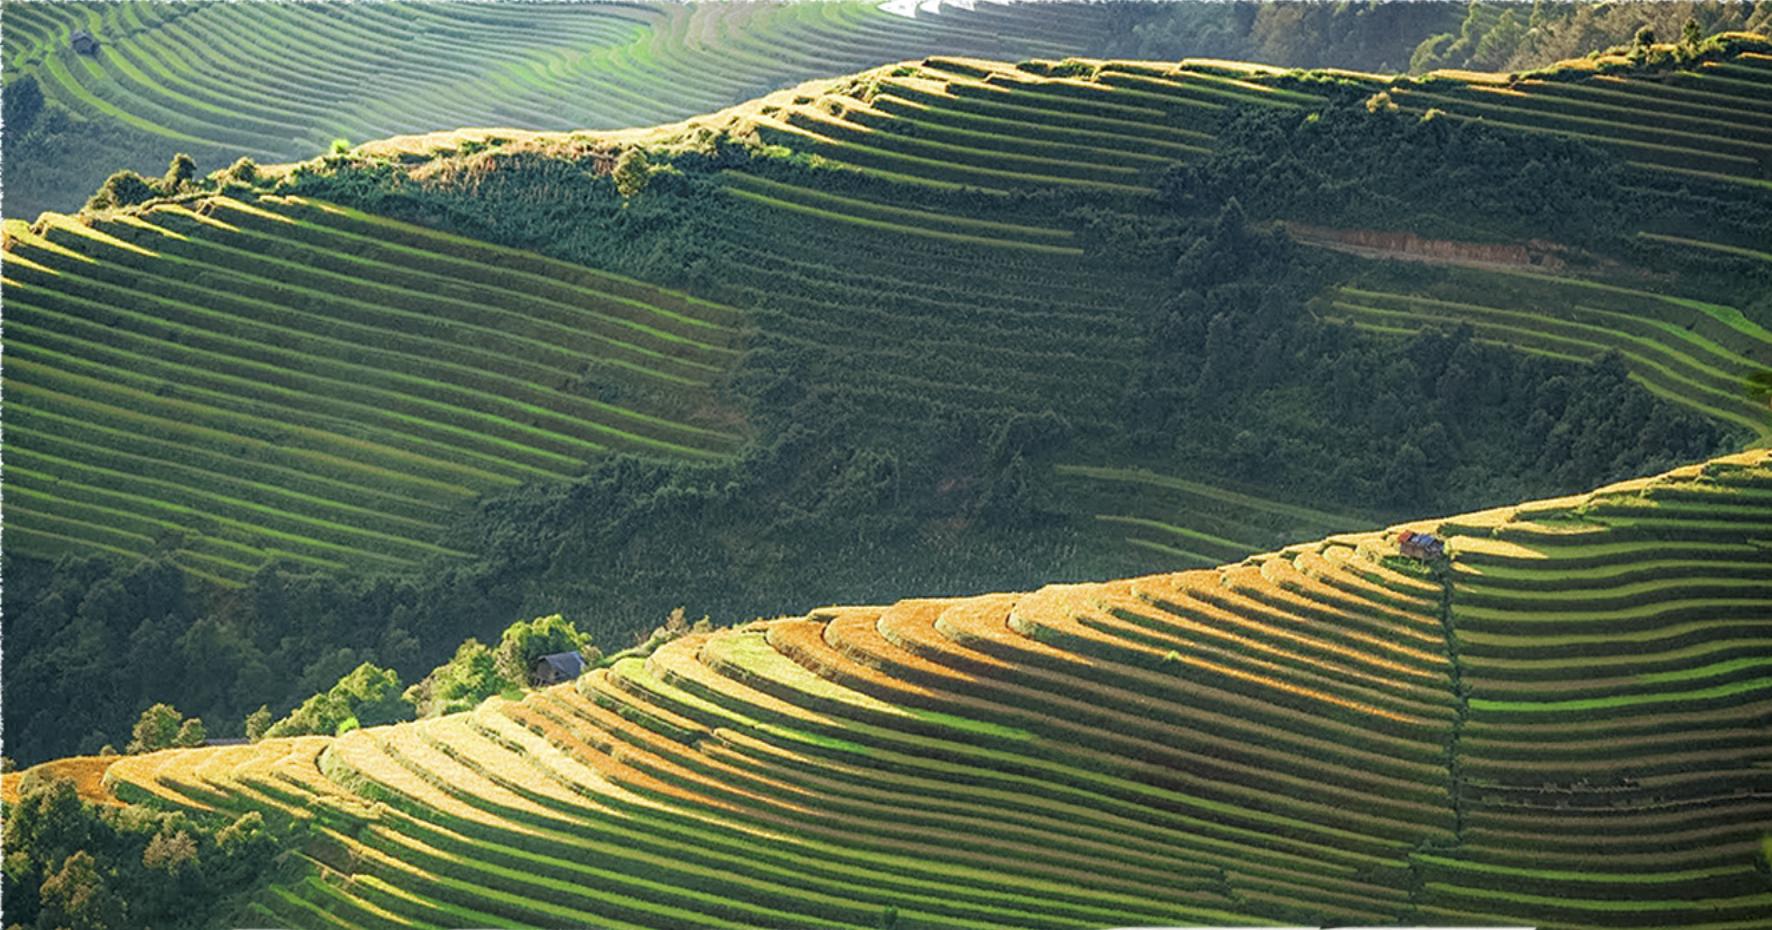 Terraced fields in Mu Cang Chai District, Yen Bai Province, Vietnam. Photo: T.V.H. / Tuoi Tre